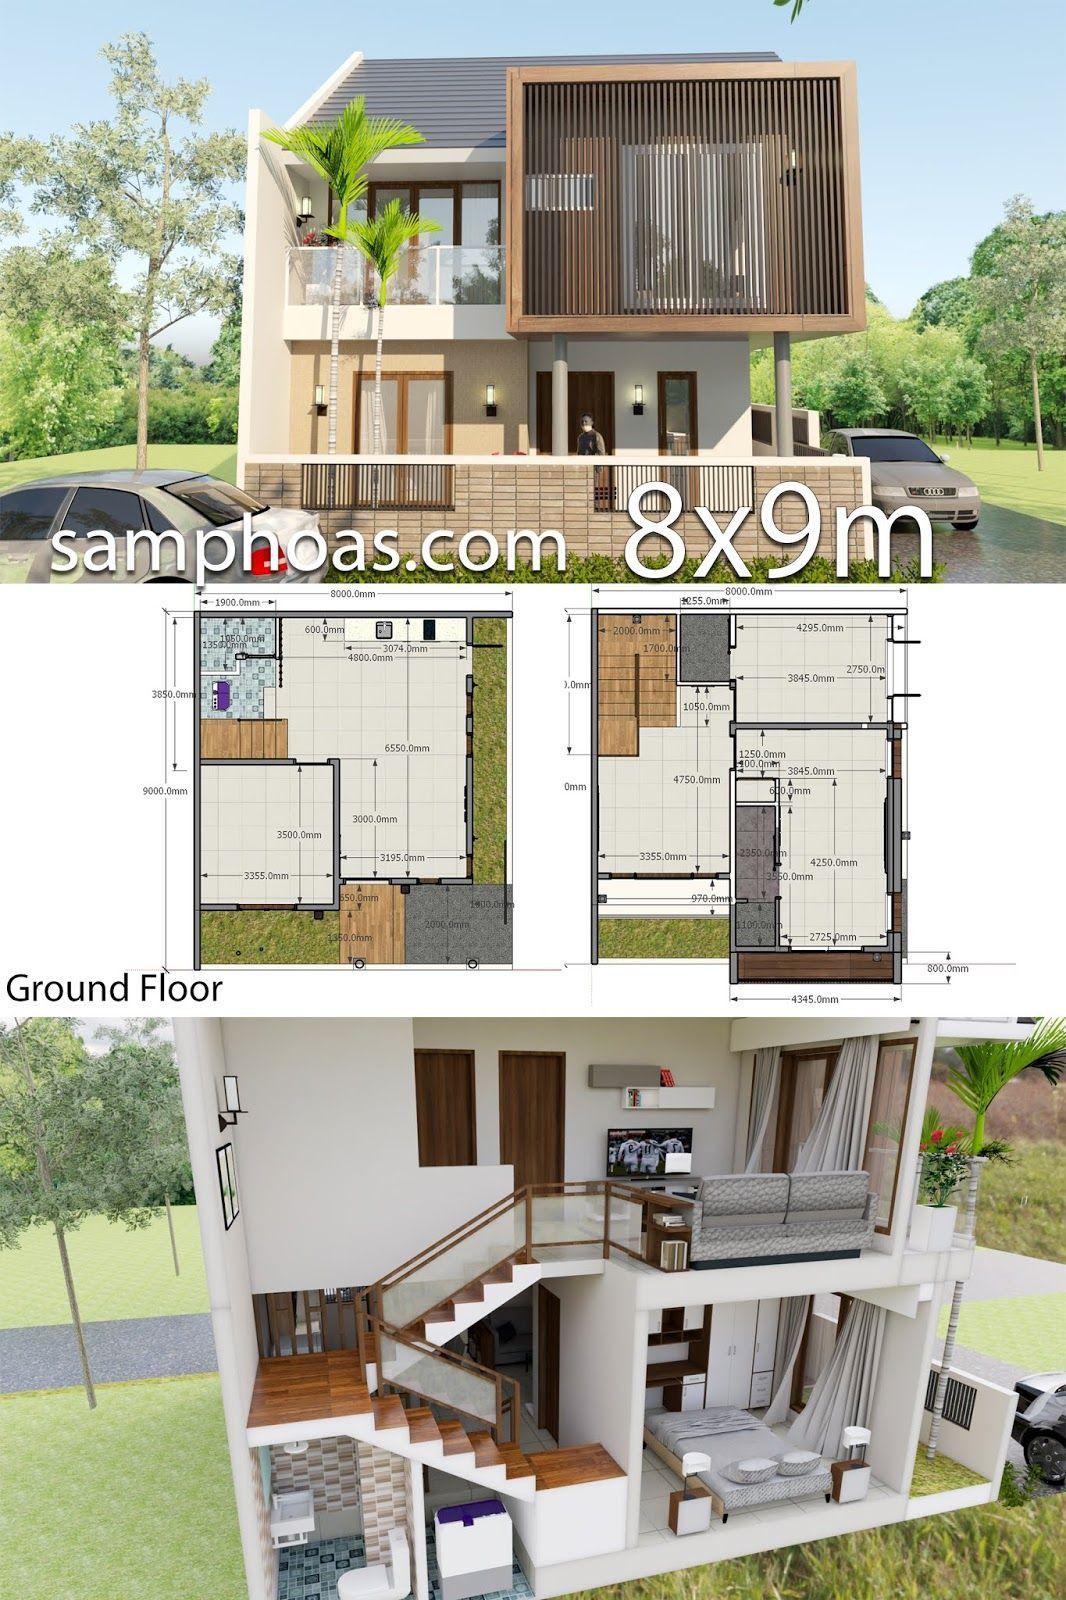 New Duplex House Plans 2021 In 2021 Interior Design Plan Modern House Plans House Construction Plan